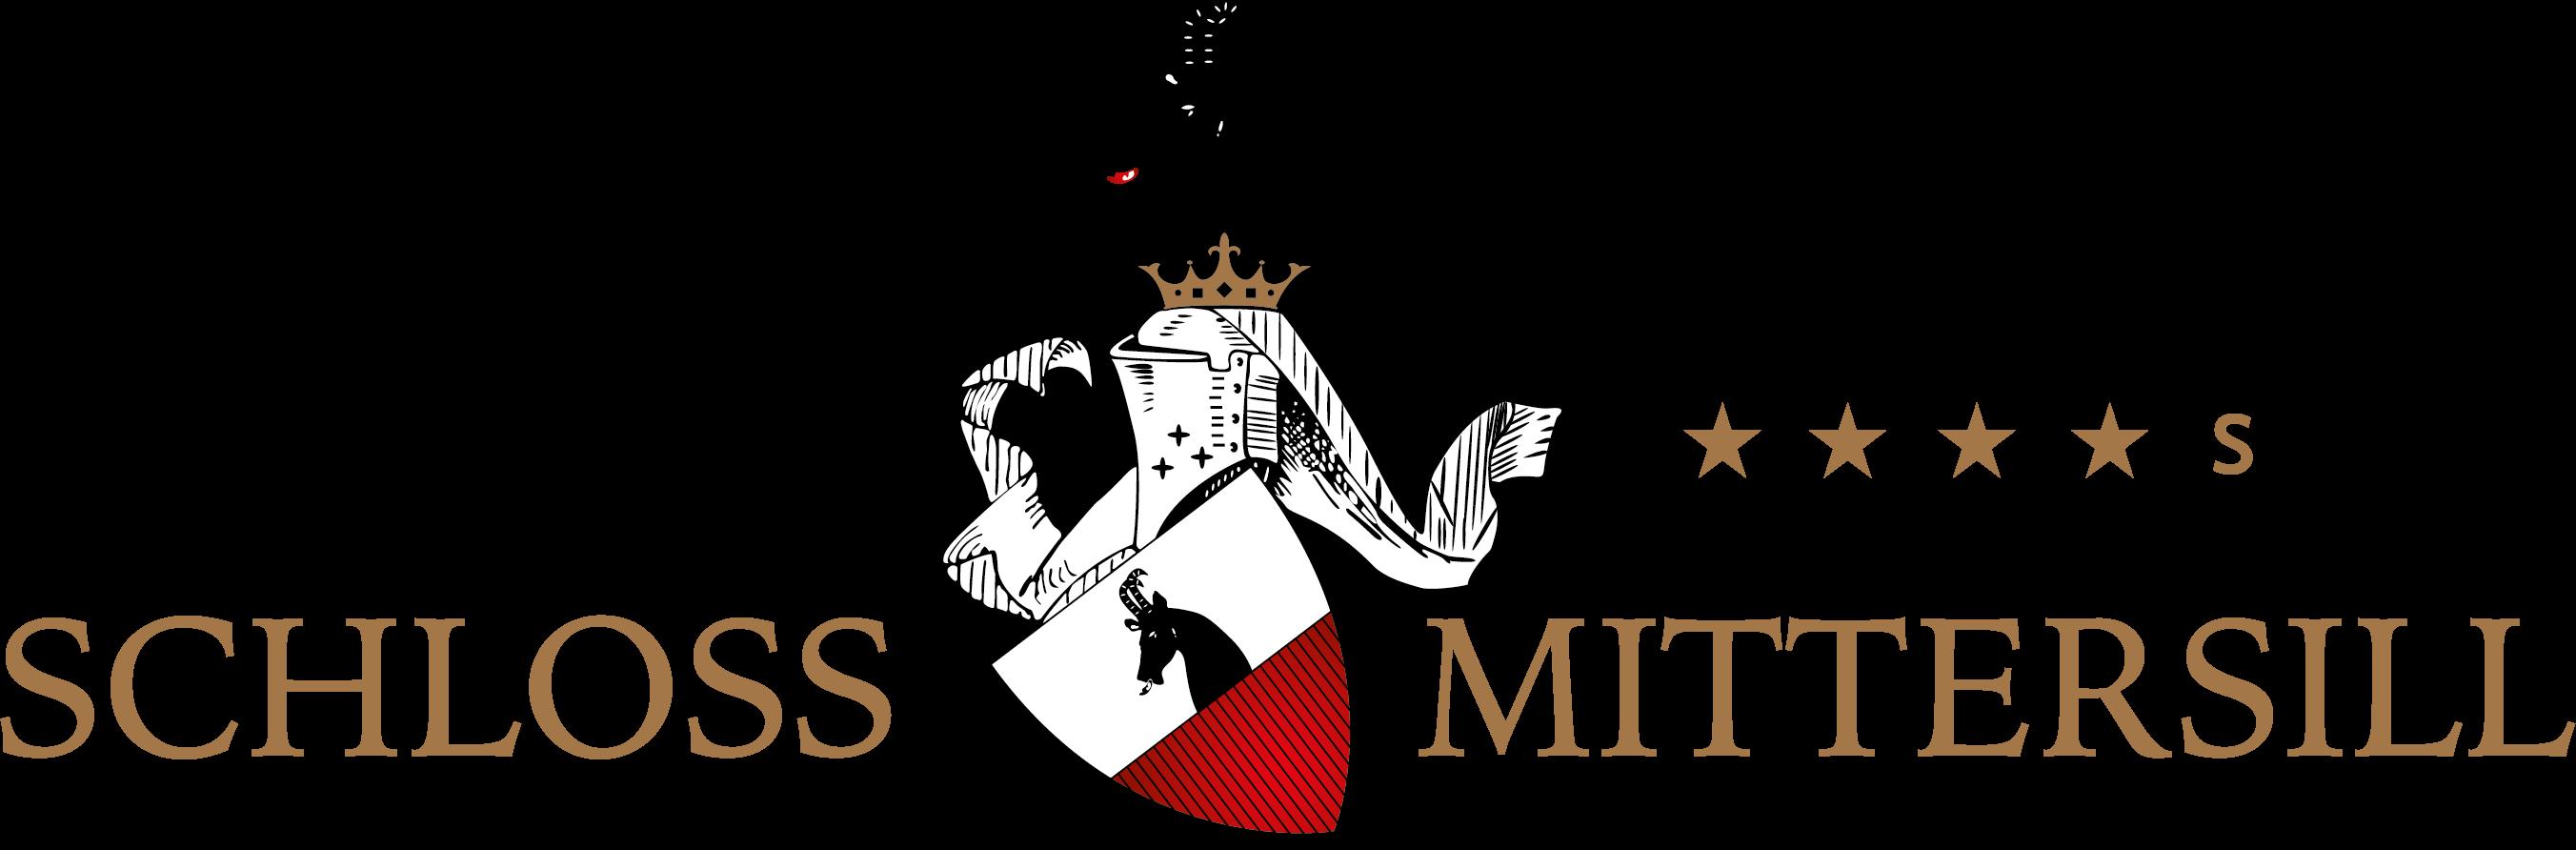 Logo_Schloss Mittersill_4sterne_IJ_V4_transparent ohne claim